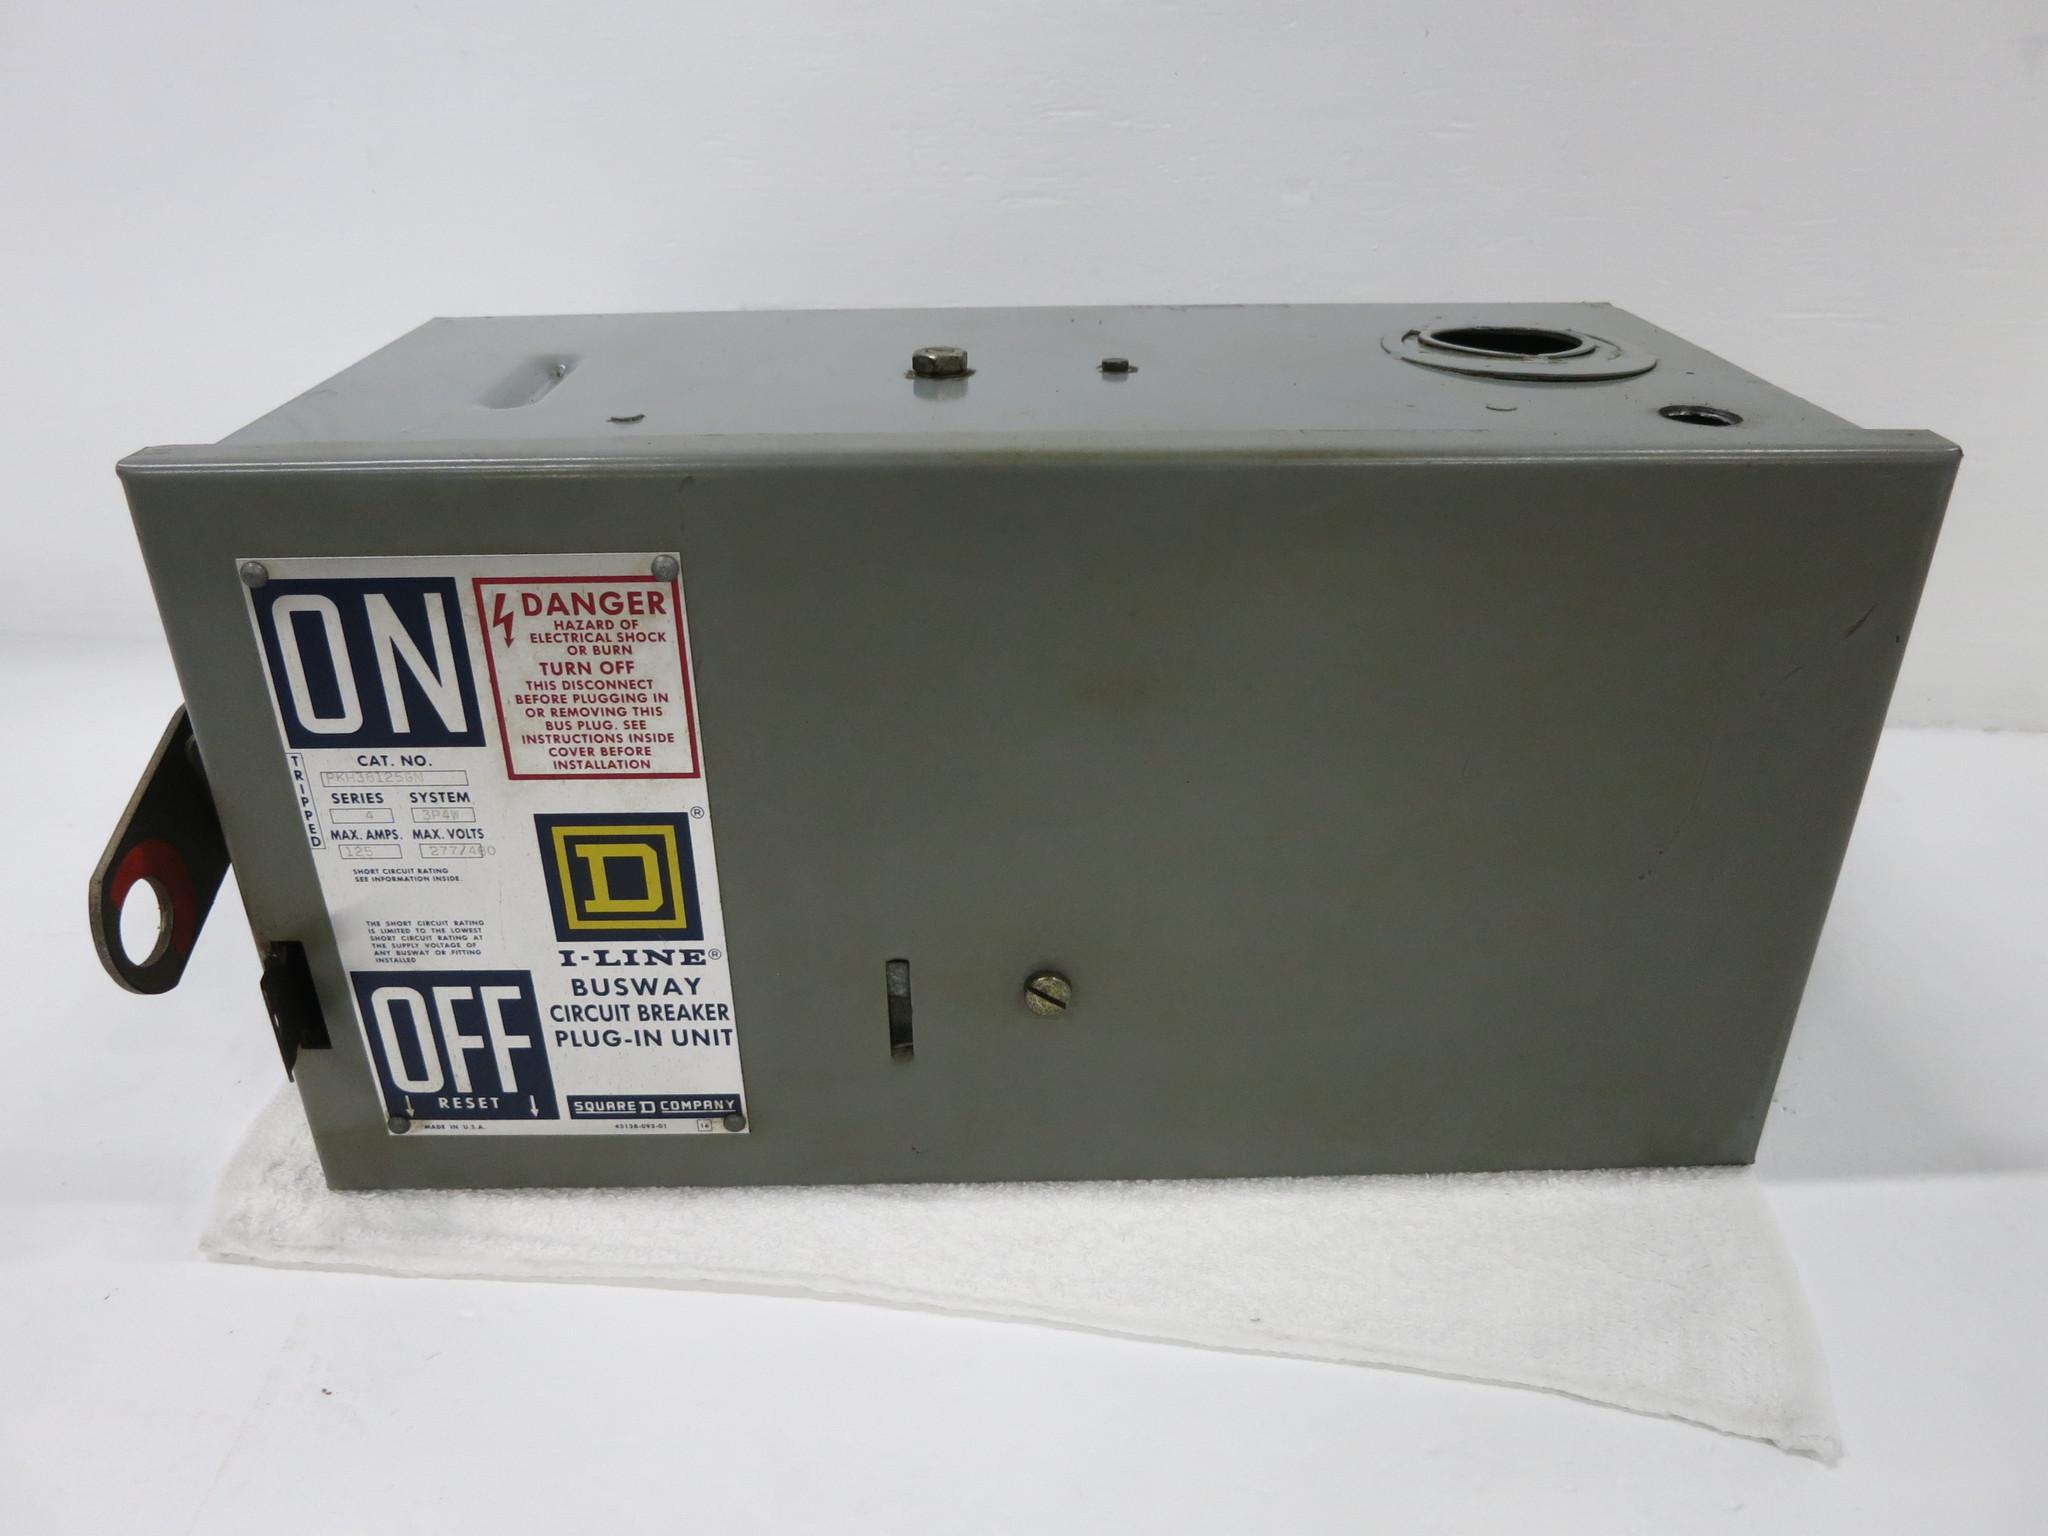 Square D PKH36125GN 125A 3P4W 480/600V I-Line Circuit Breaker Bus Plug on